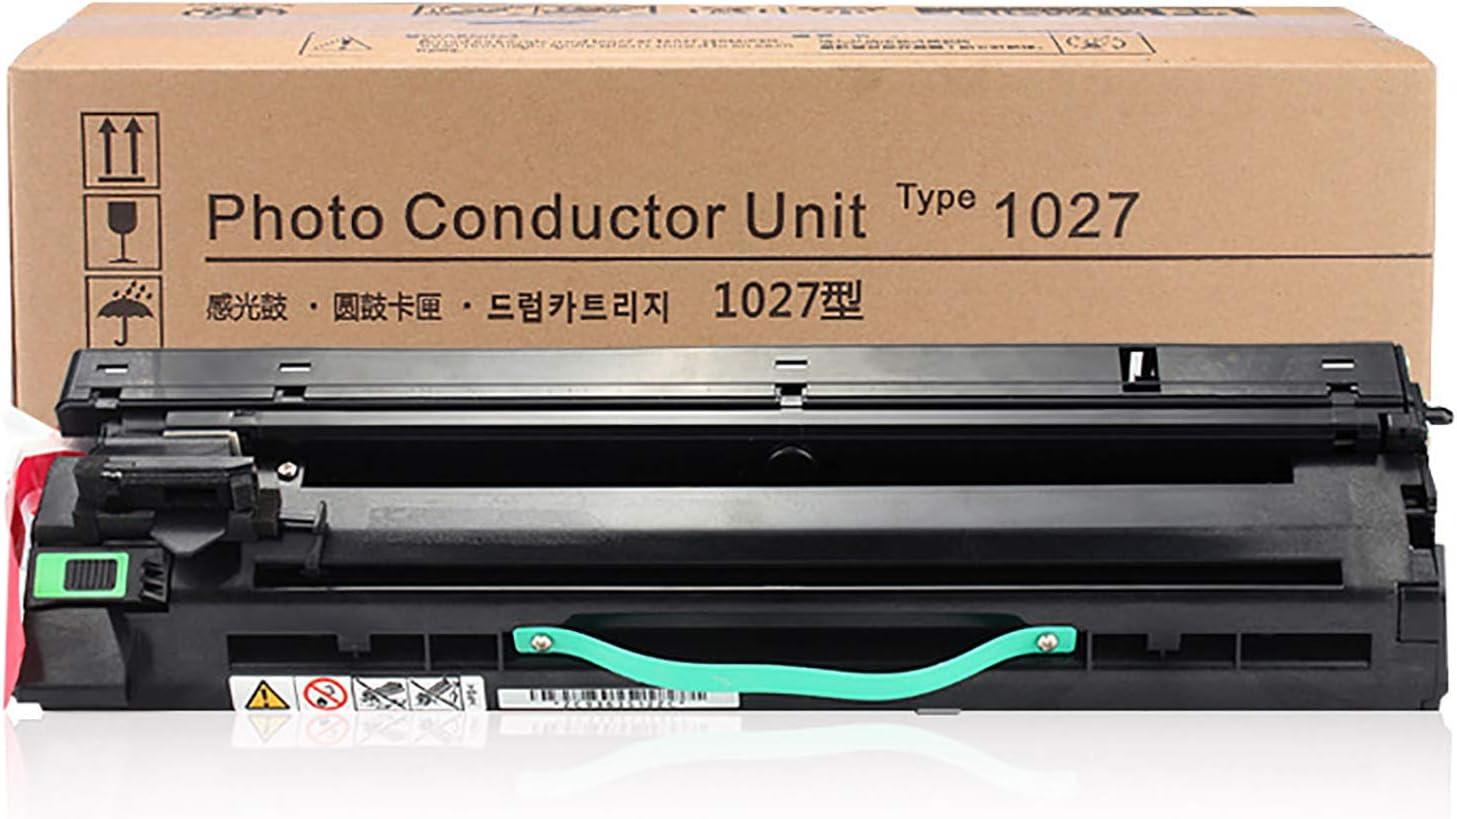 Compatible Drum Kit Replacement for RICOH MP3351 Drum Kit for RICOH Docucentre MP1022 1027 1032 2022 2027 2032 3025 3030 2352SP 2510 2550 2851 2852 3010 3350 3351 3352 Laser Printer,Black